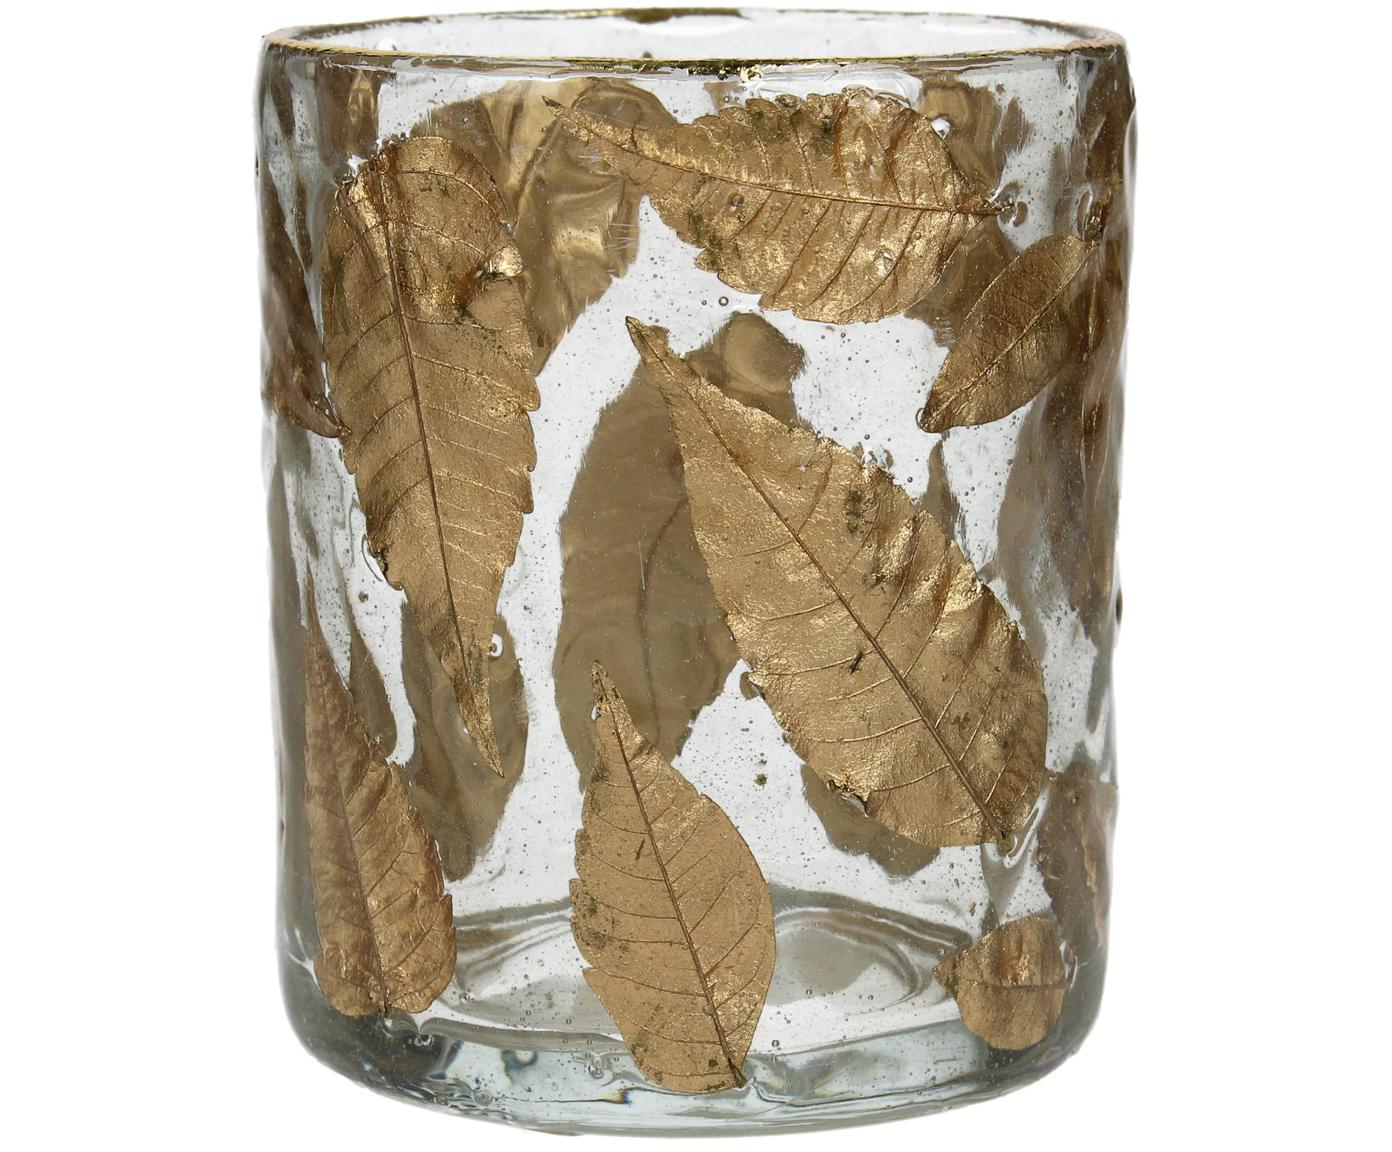 Portacandela Golden Leaf, Vetro, foglie, Trasparente, dorato, Ø 8 x Alt. 9 cm